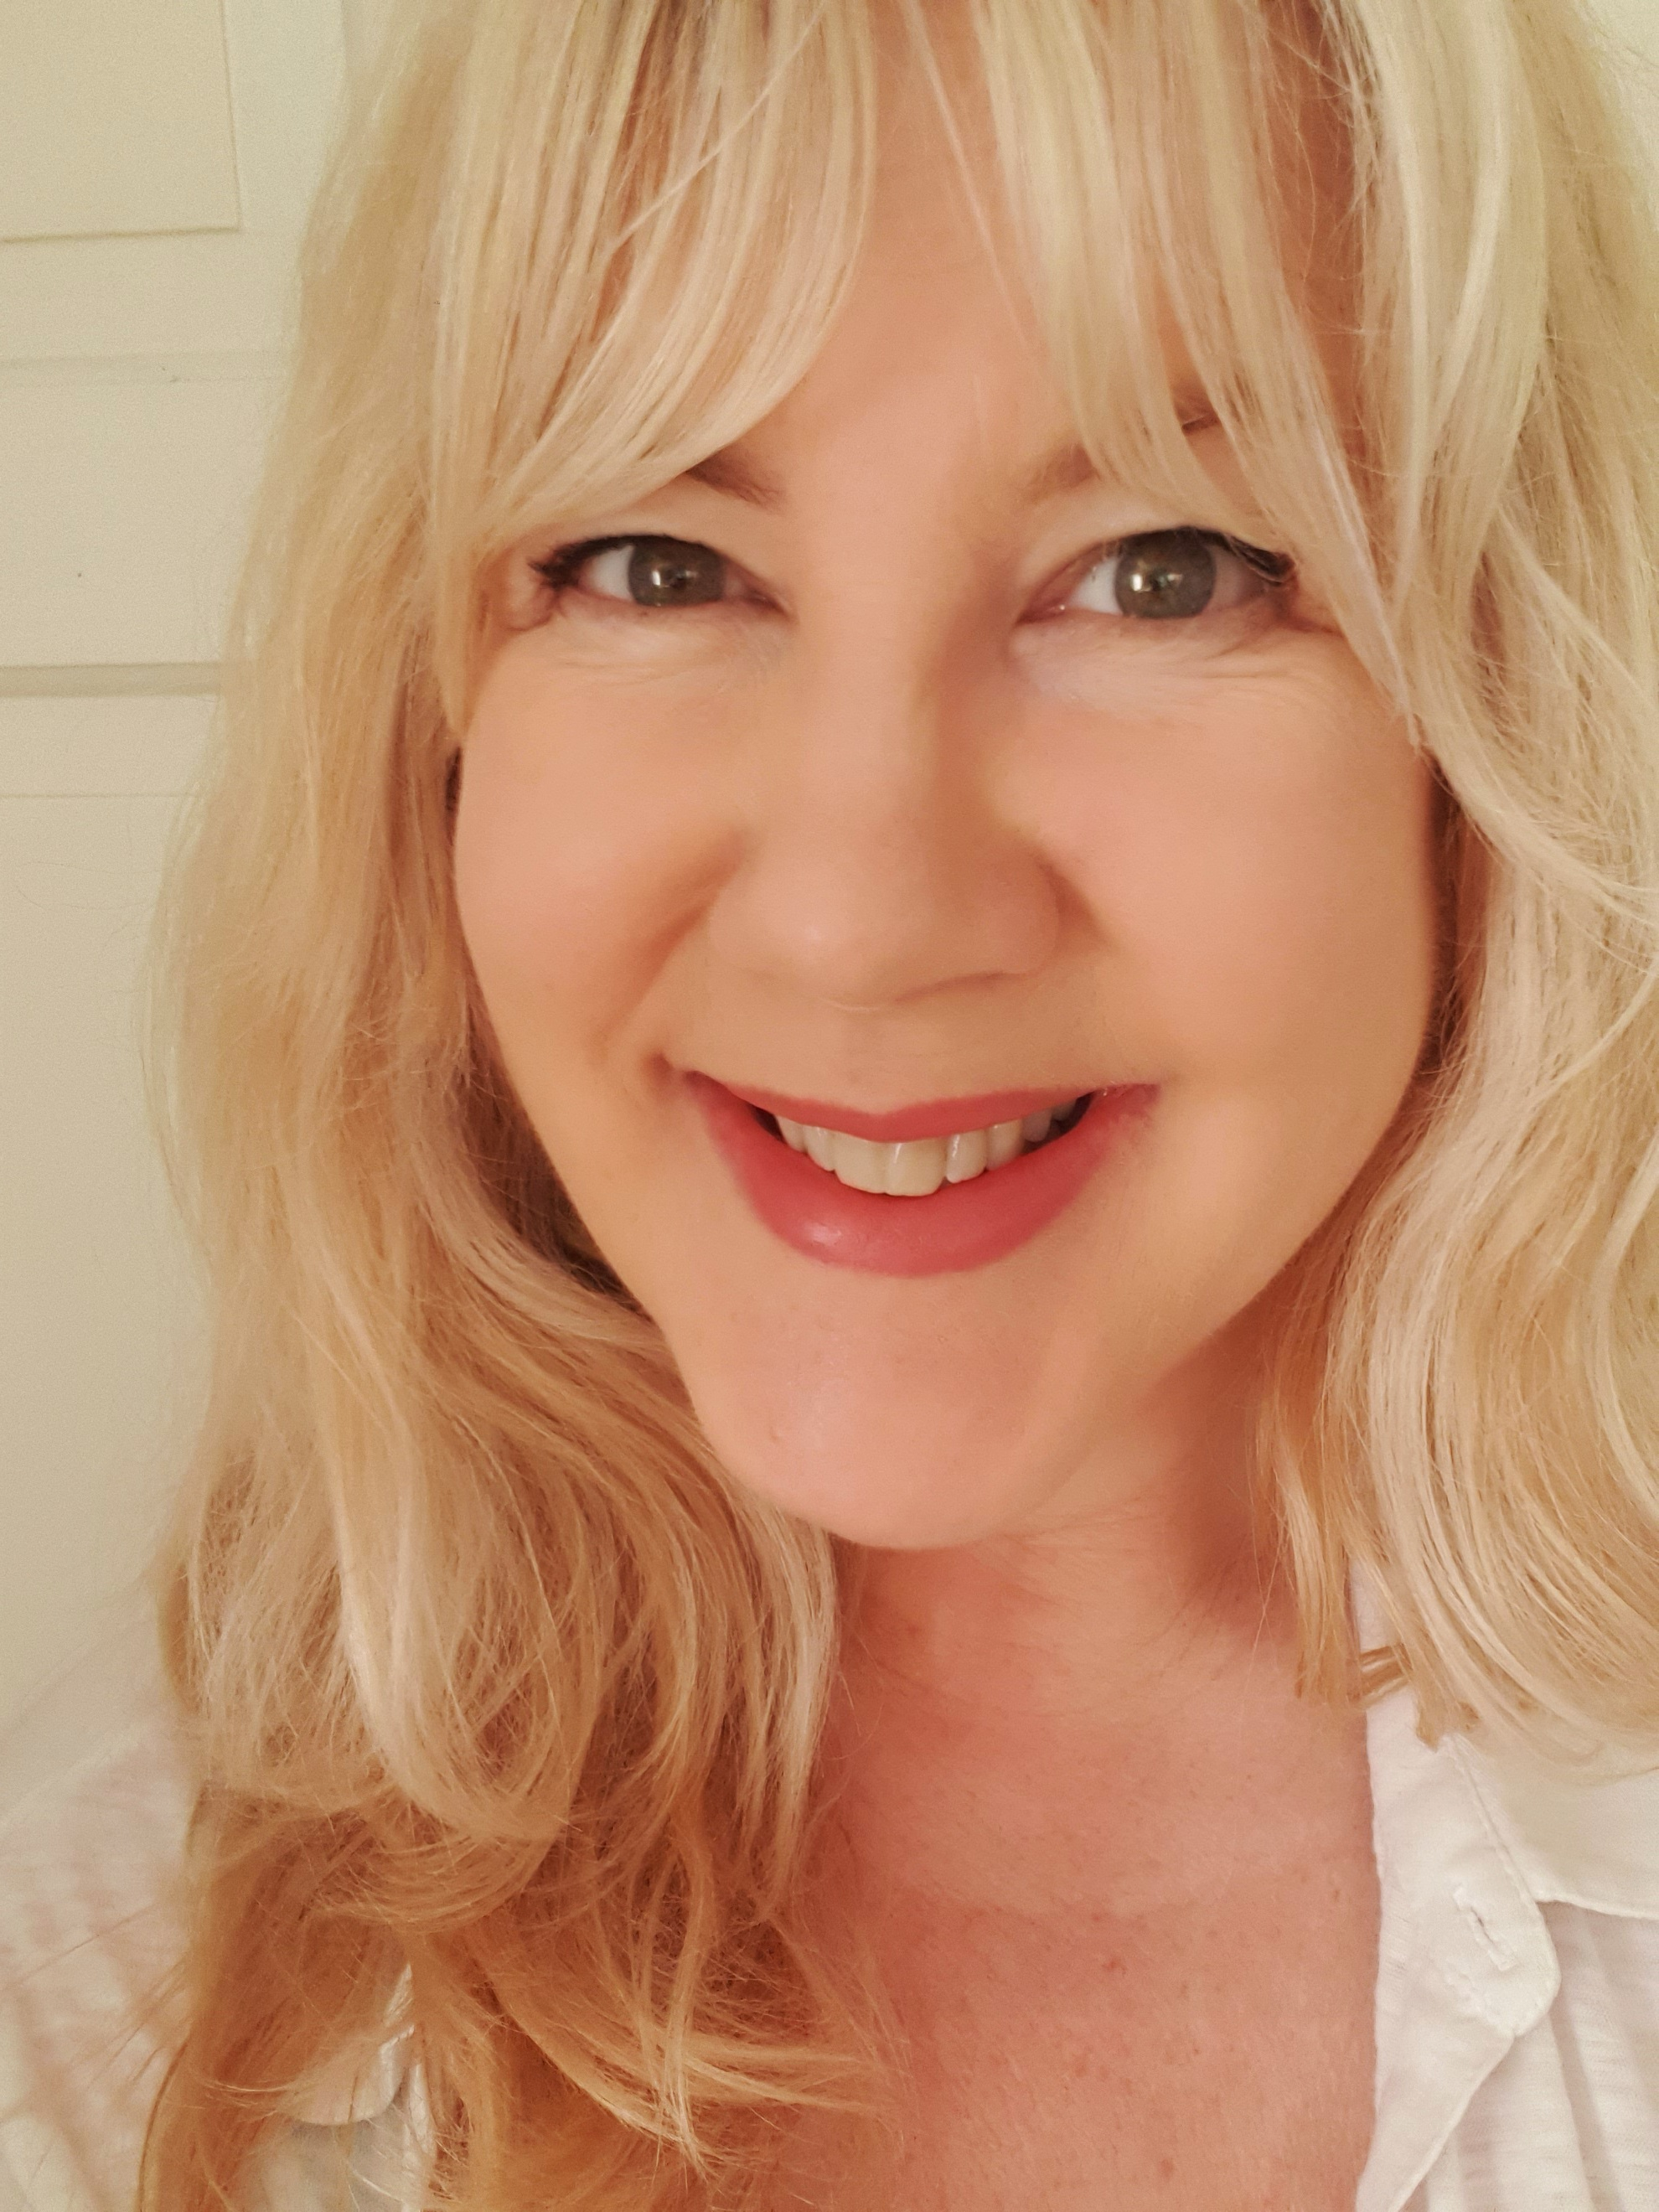 Sharon Nicholson